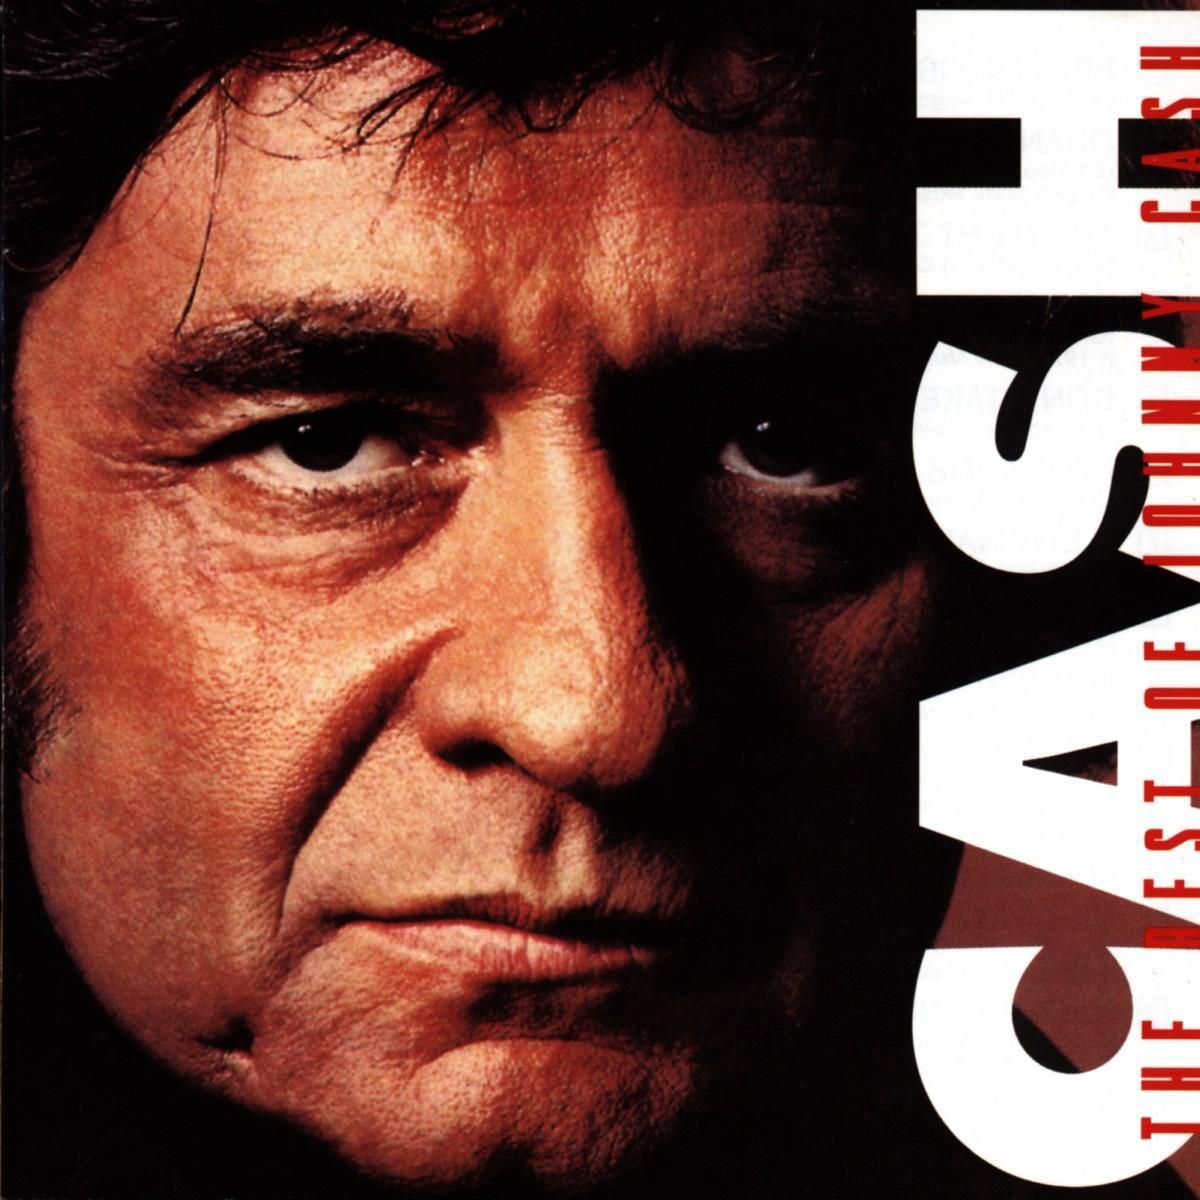 Best of Johnny Cash - Johnny Cash